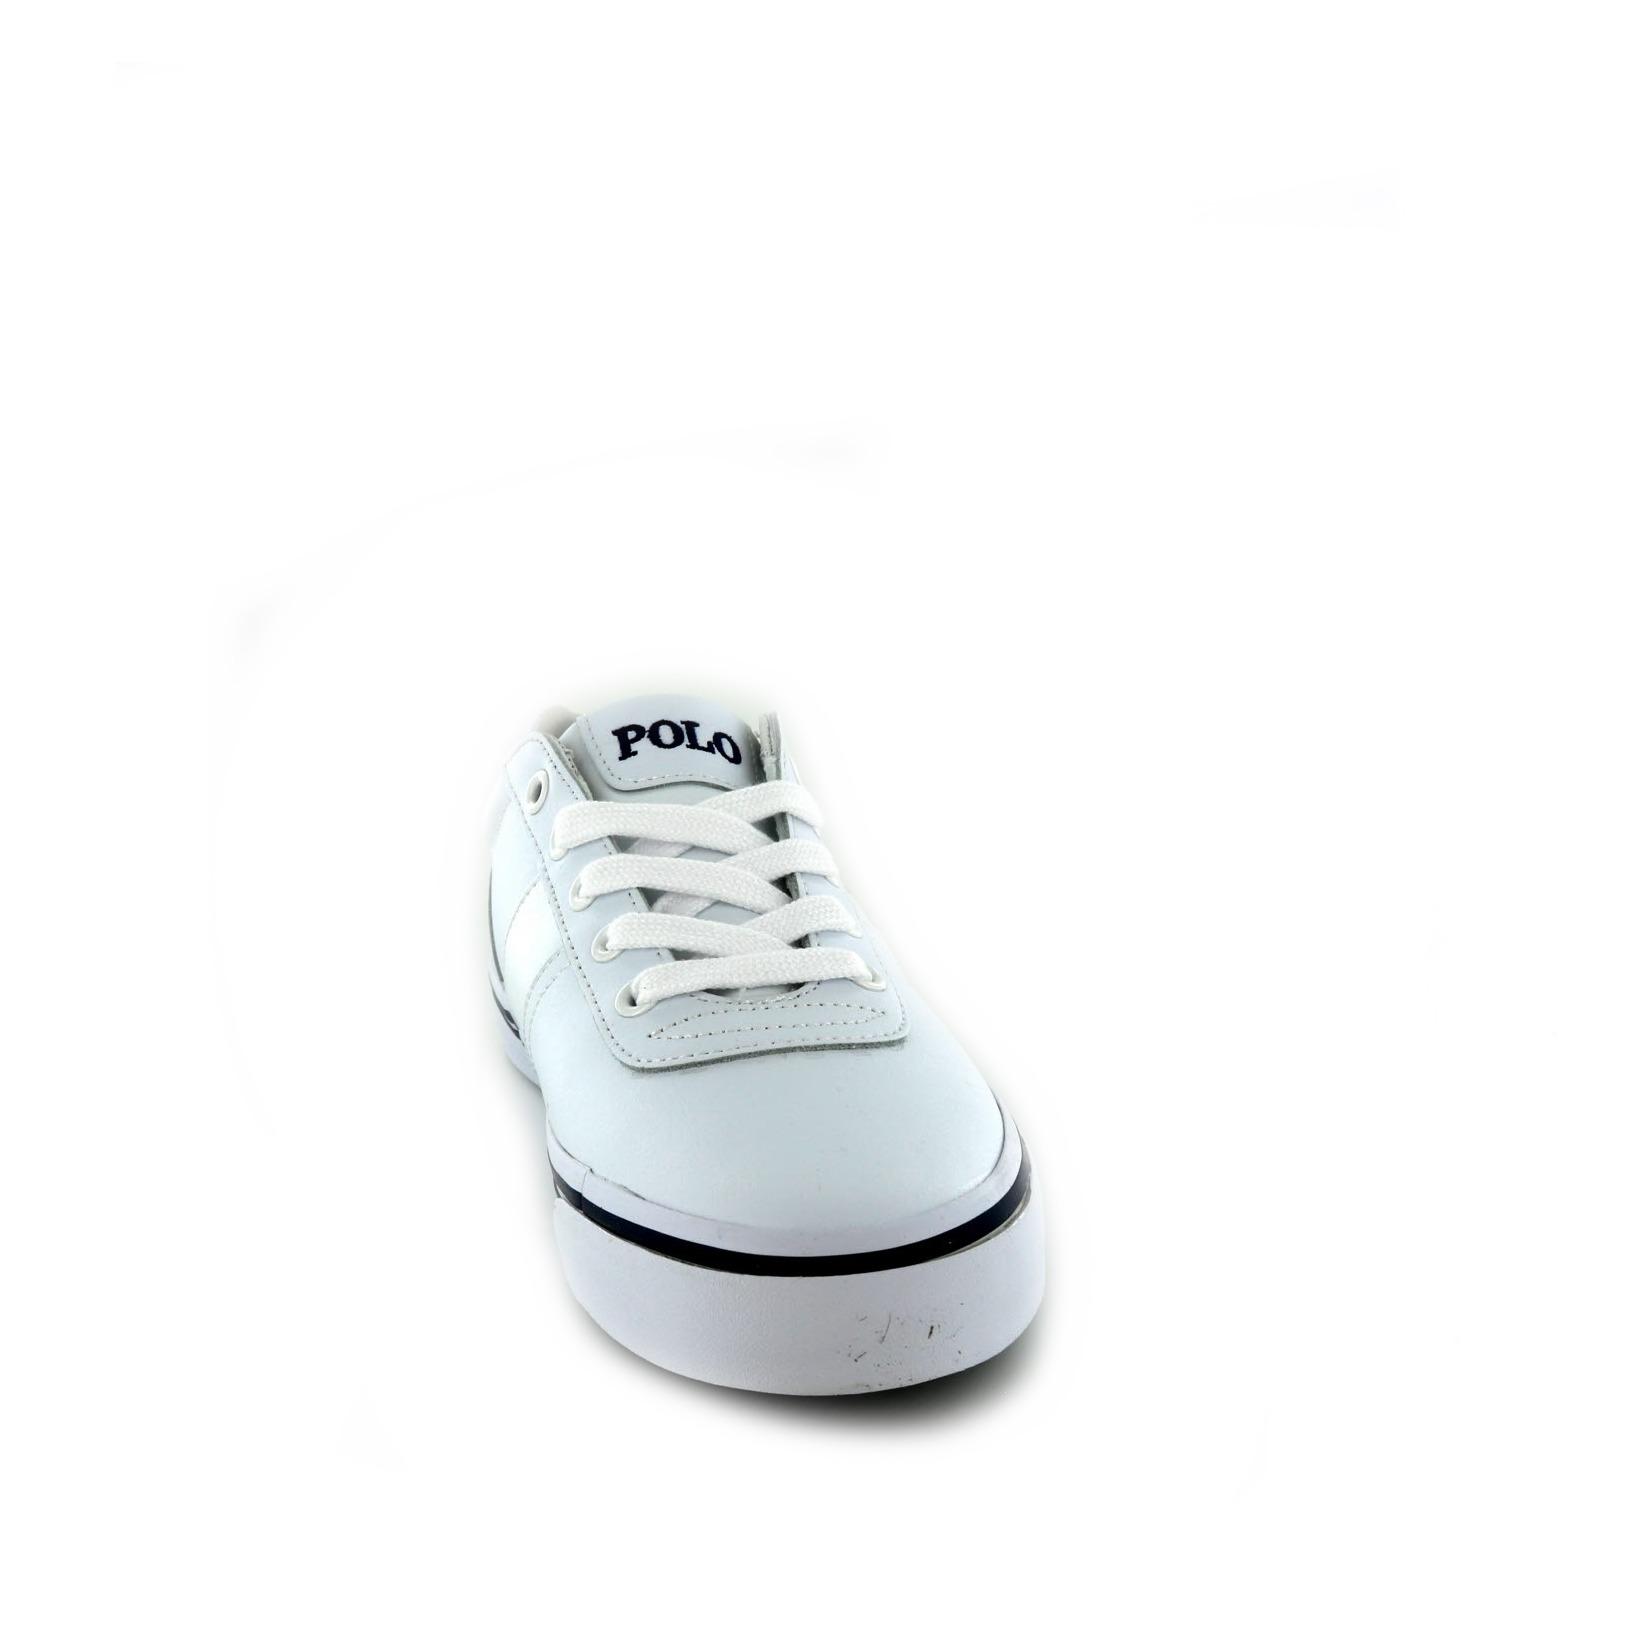 Polo Ralph Lauren / Pizzo Scarpe - Scarpe Da Ginnastica, Bianco